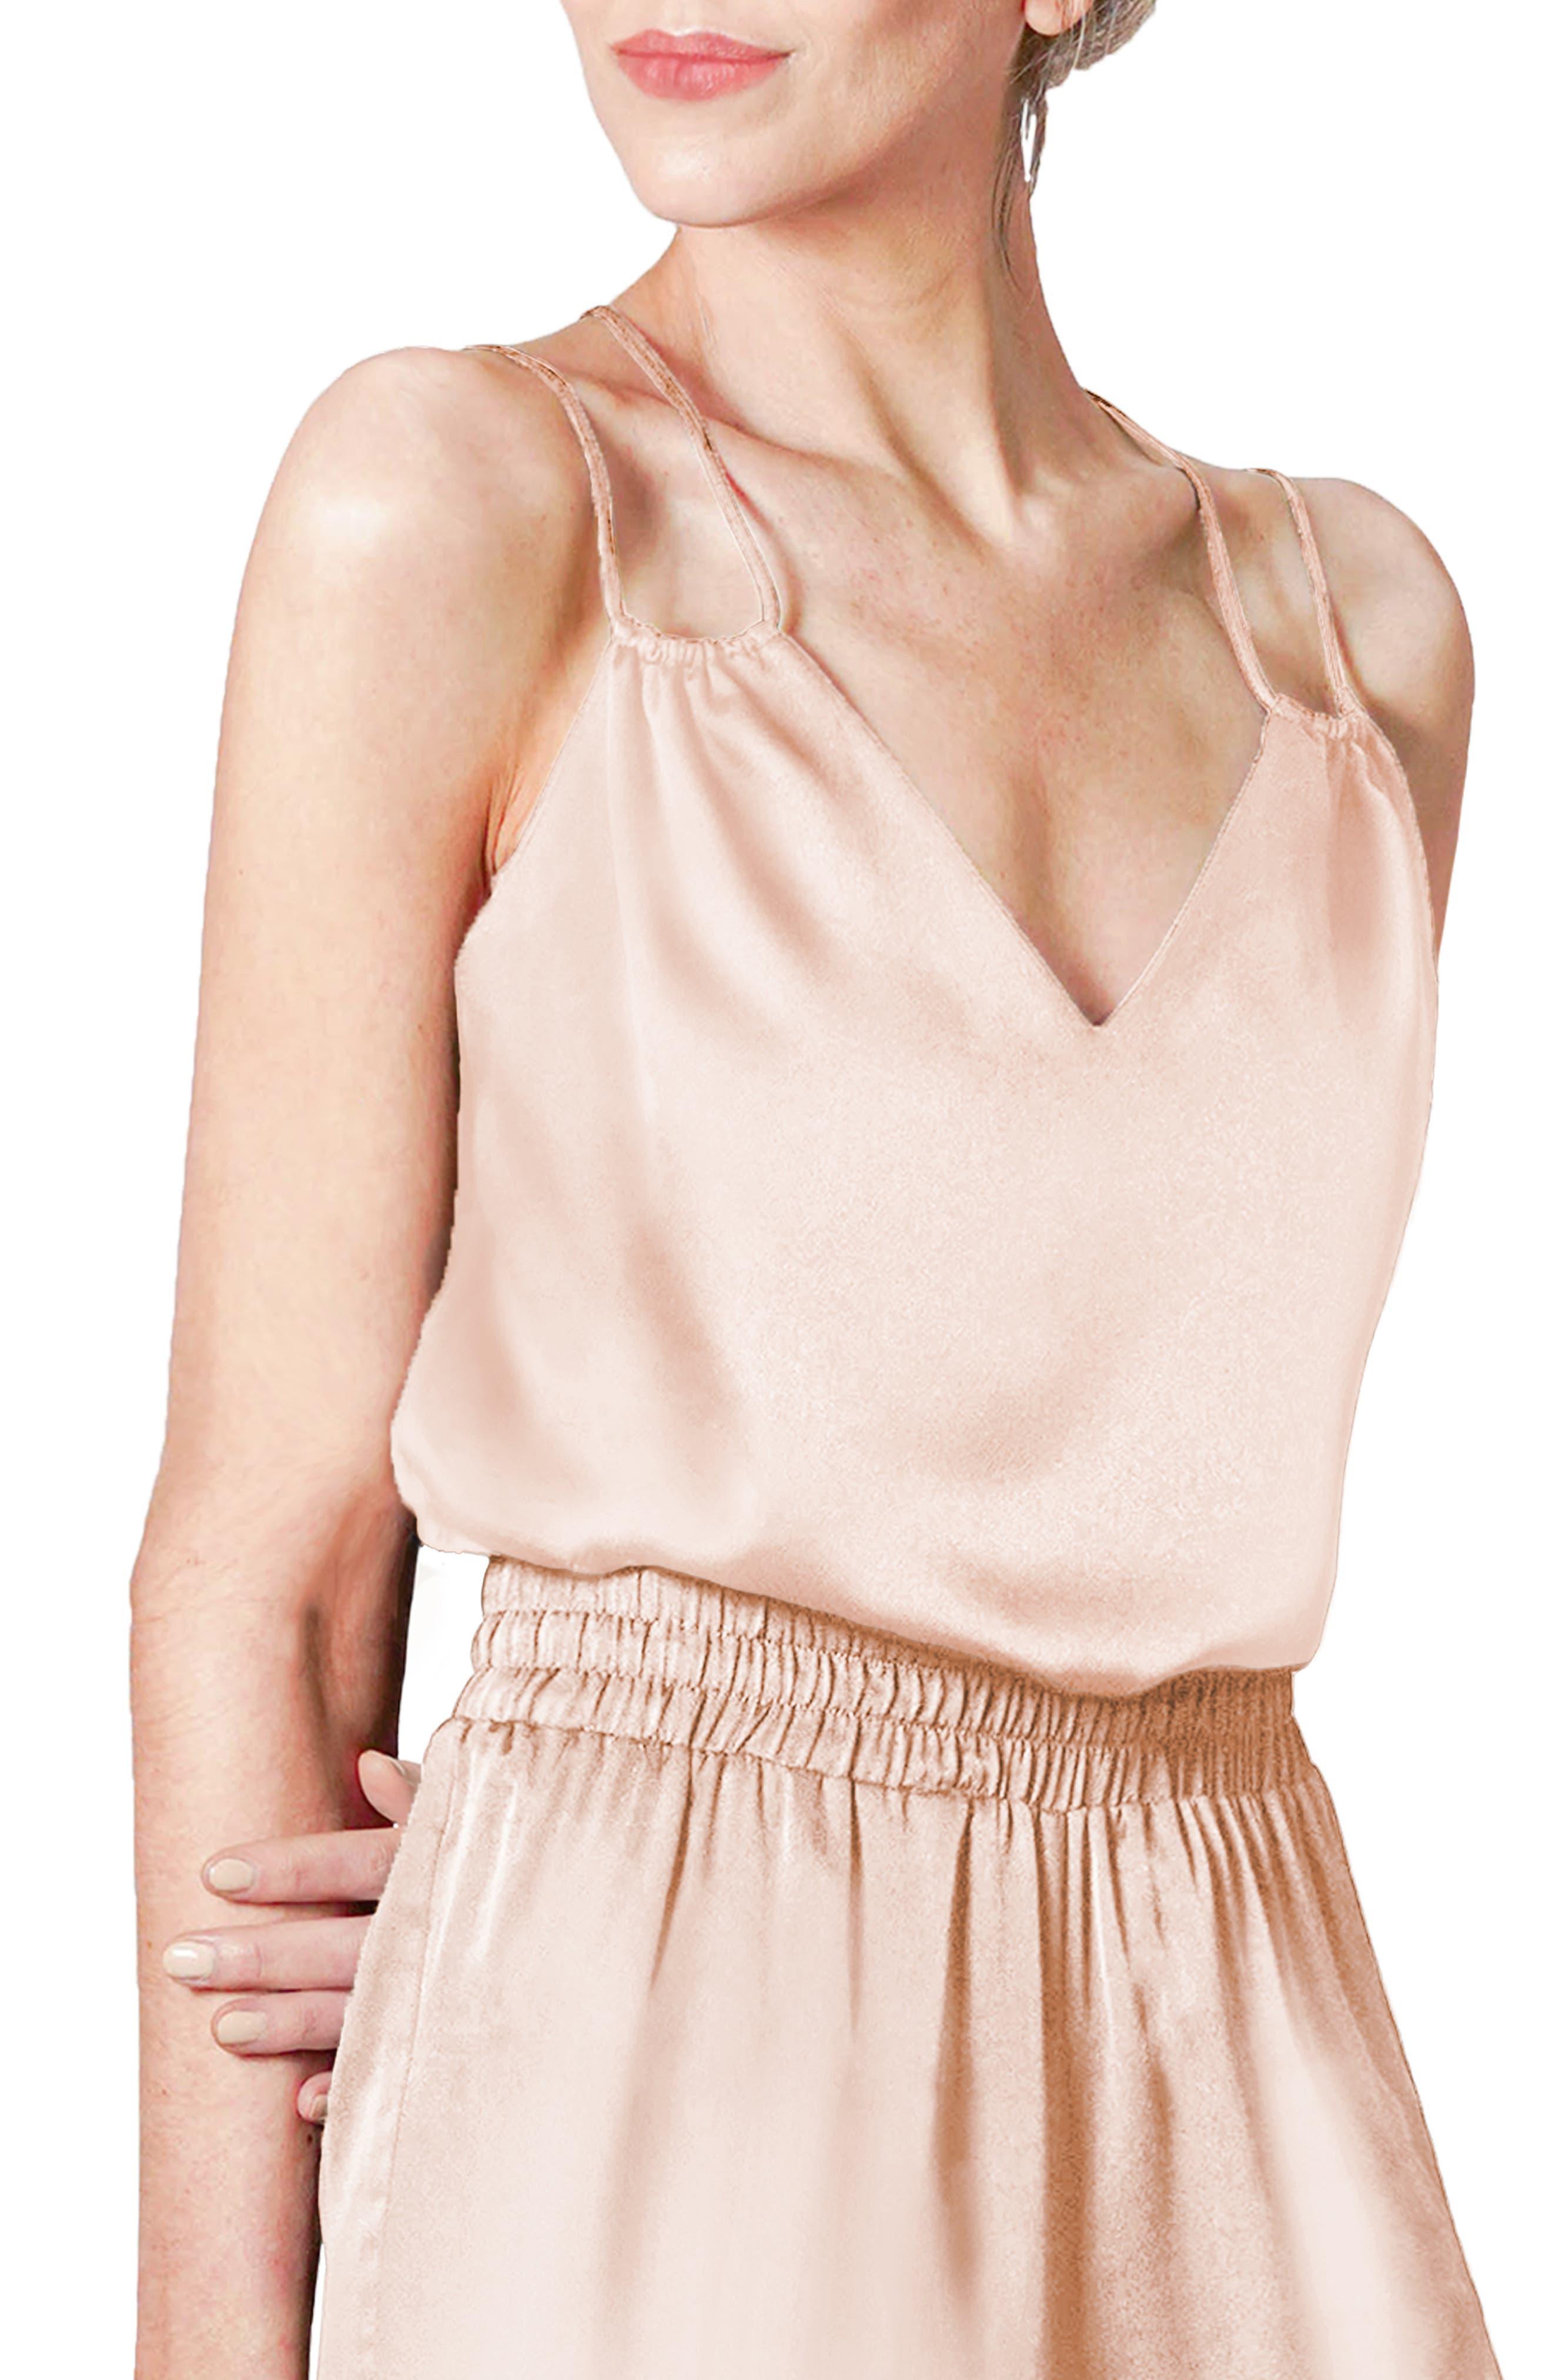 Women's Light Codes Double Strap Camisole